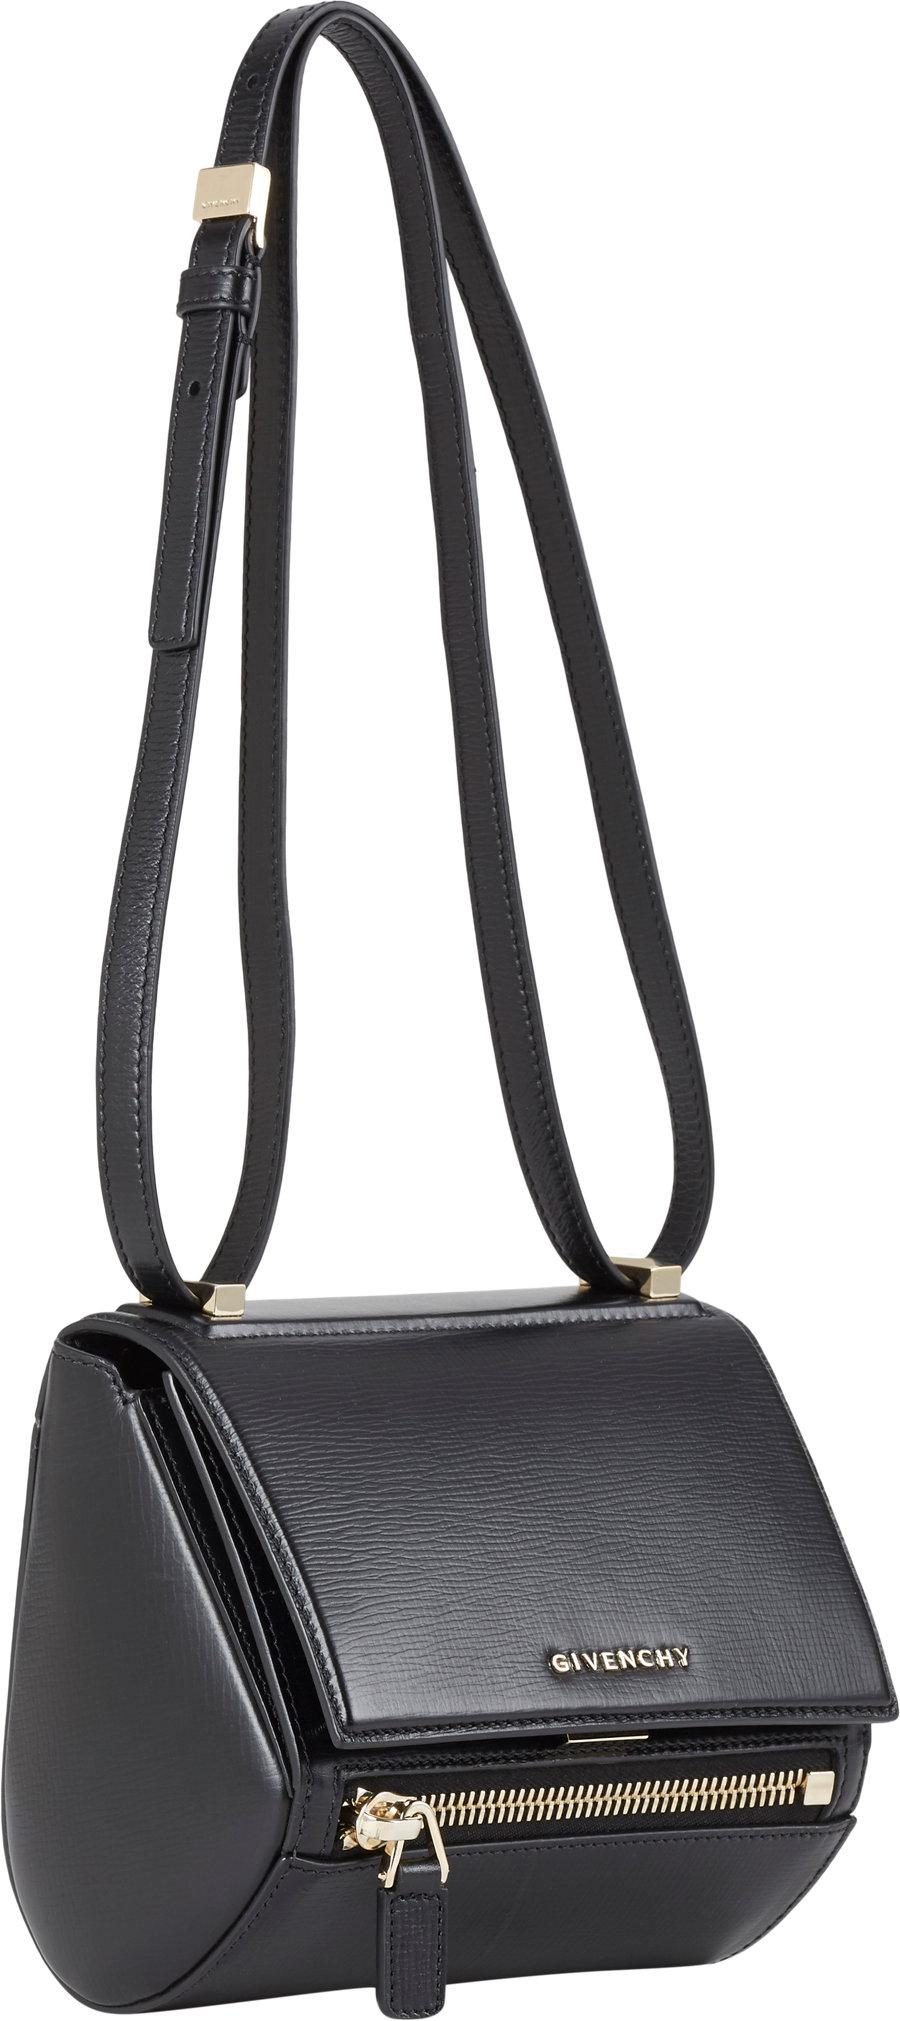 fd37bd36b0 Givenchy Mini Pandora Box Crossbody in Black - Lyst